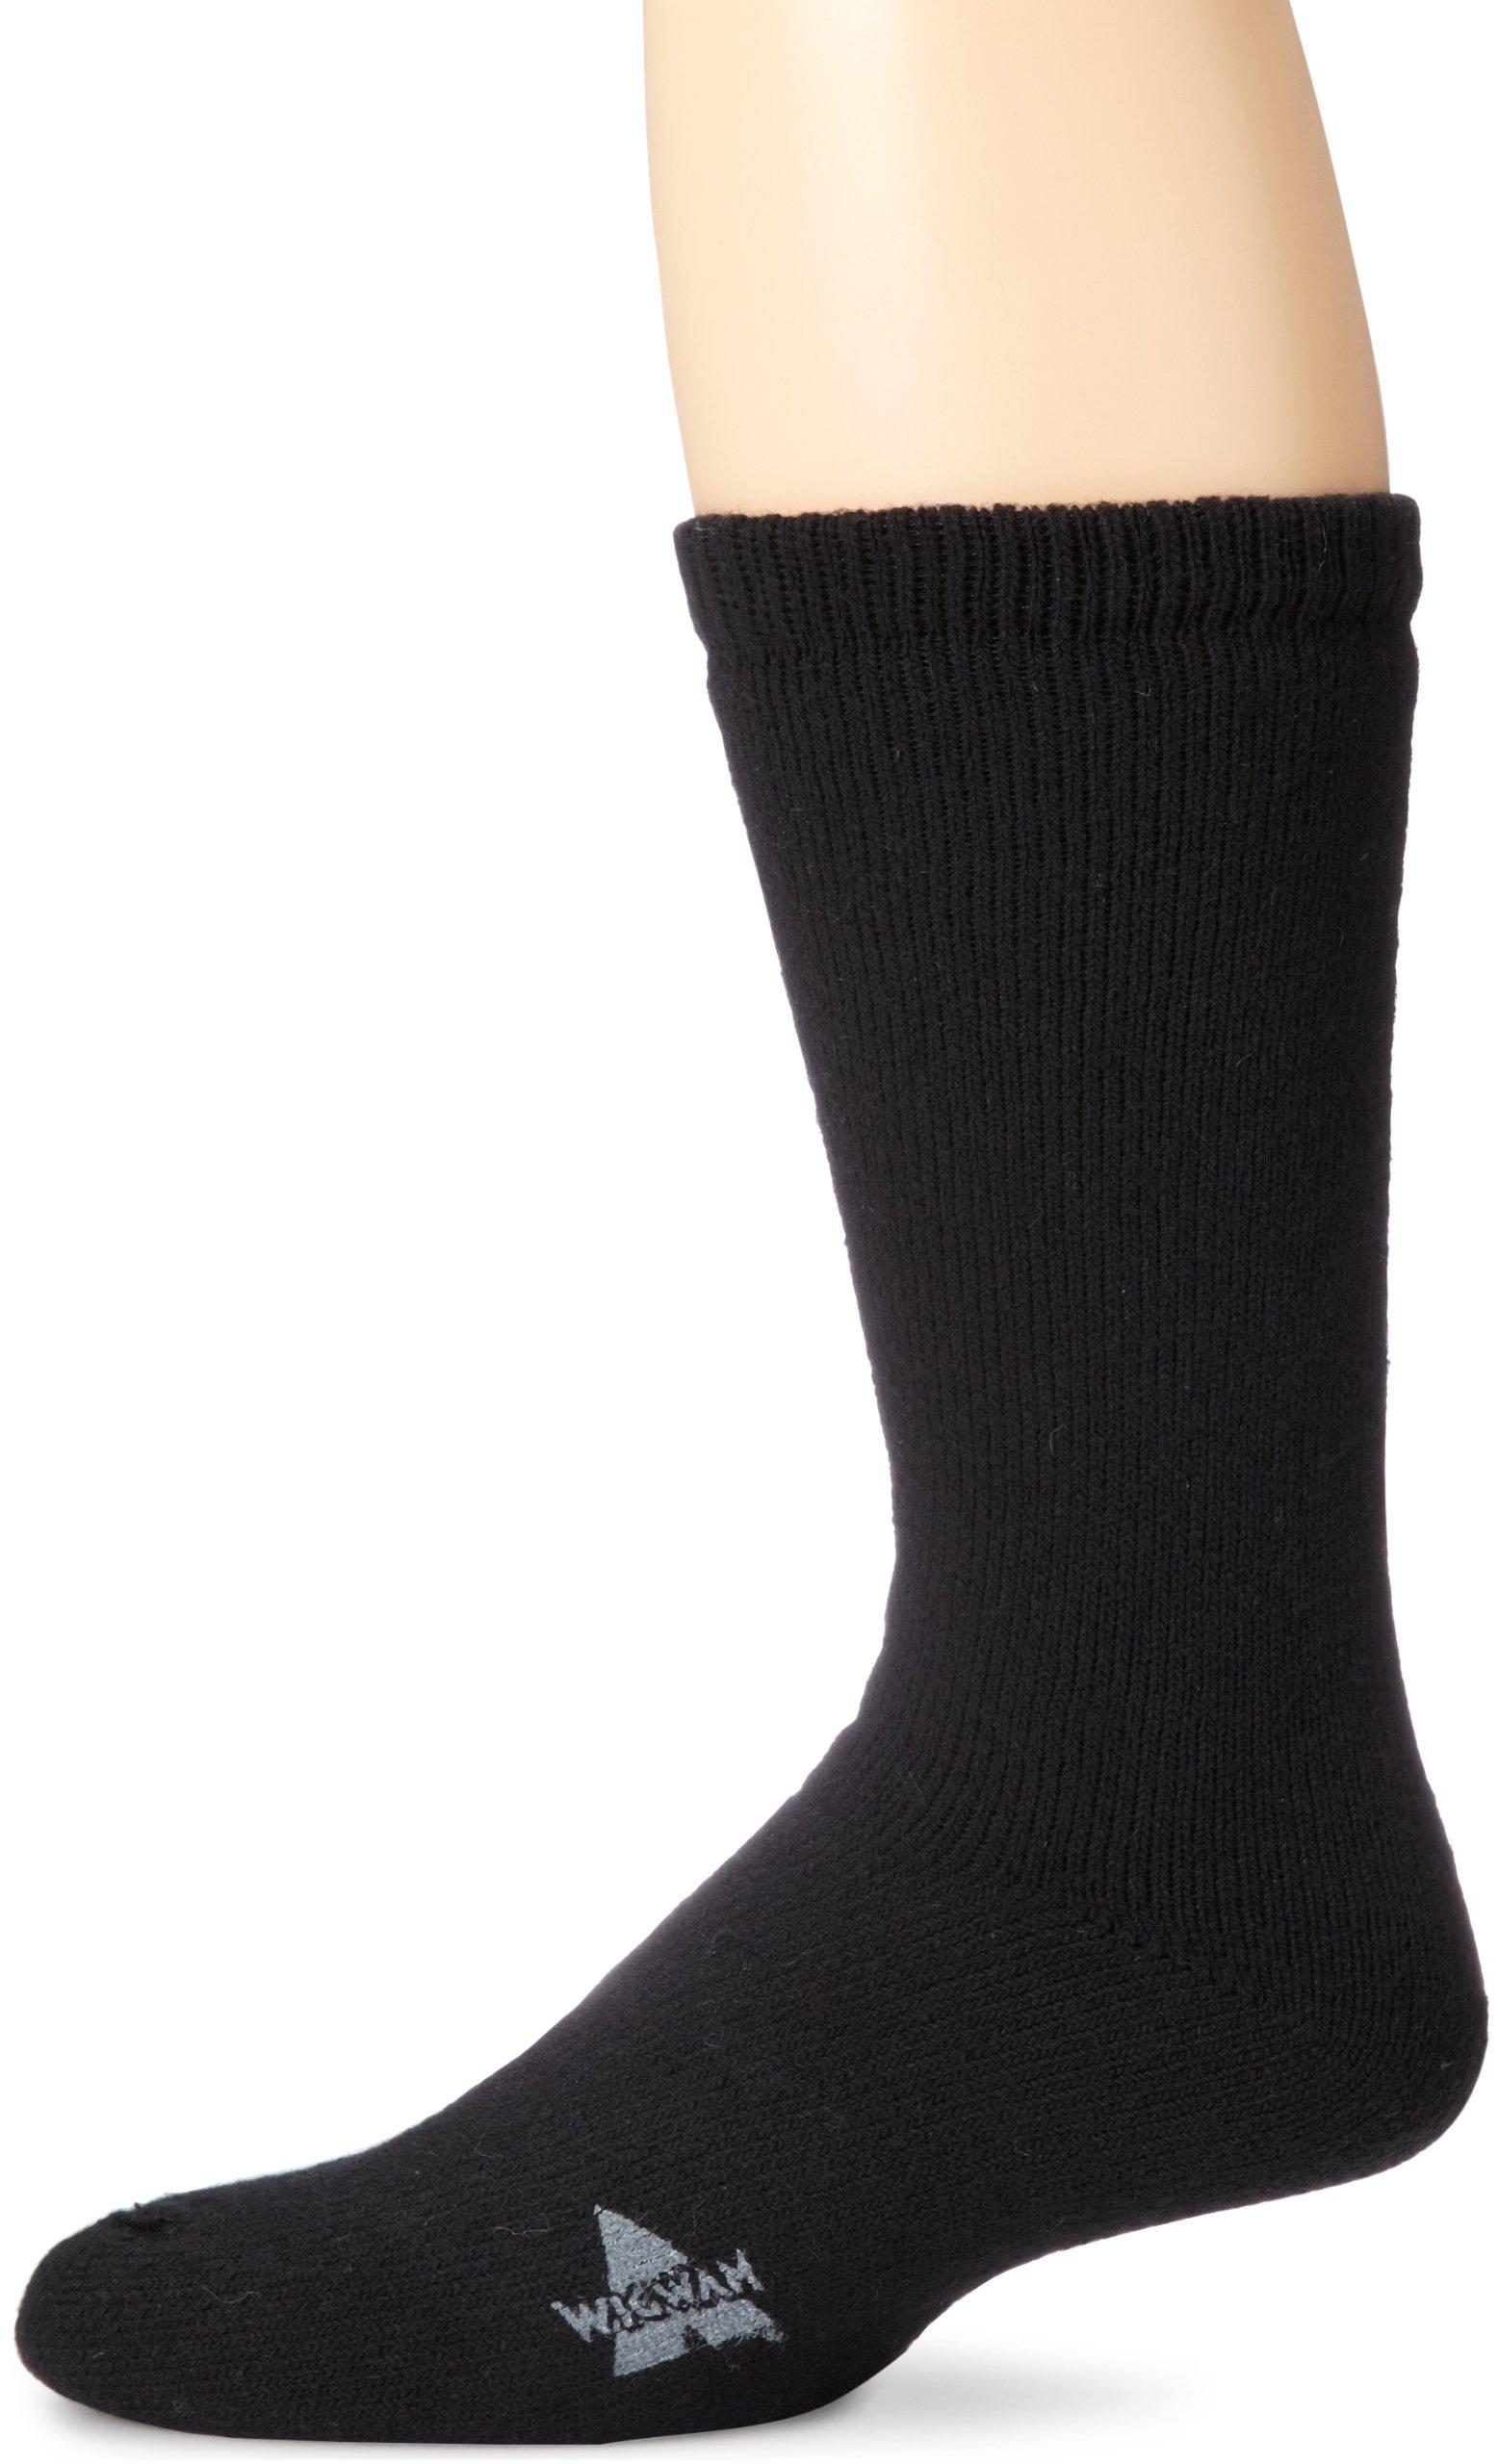 Wigwam Men's 40 Below Heavyweight Boot Socks, Black, Medium by Wigwam